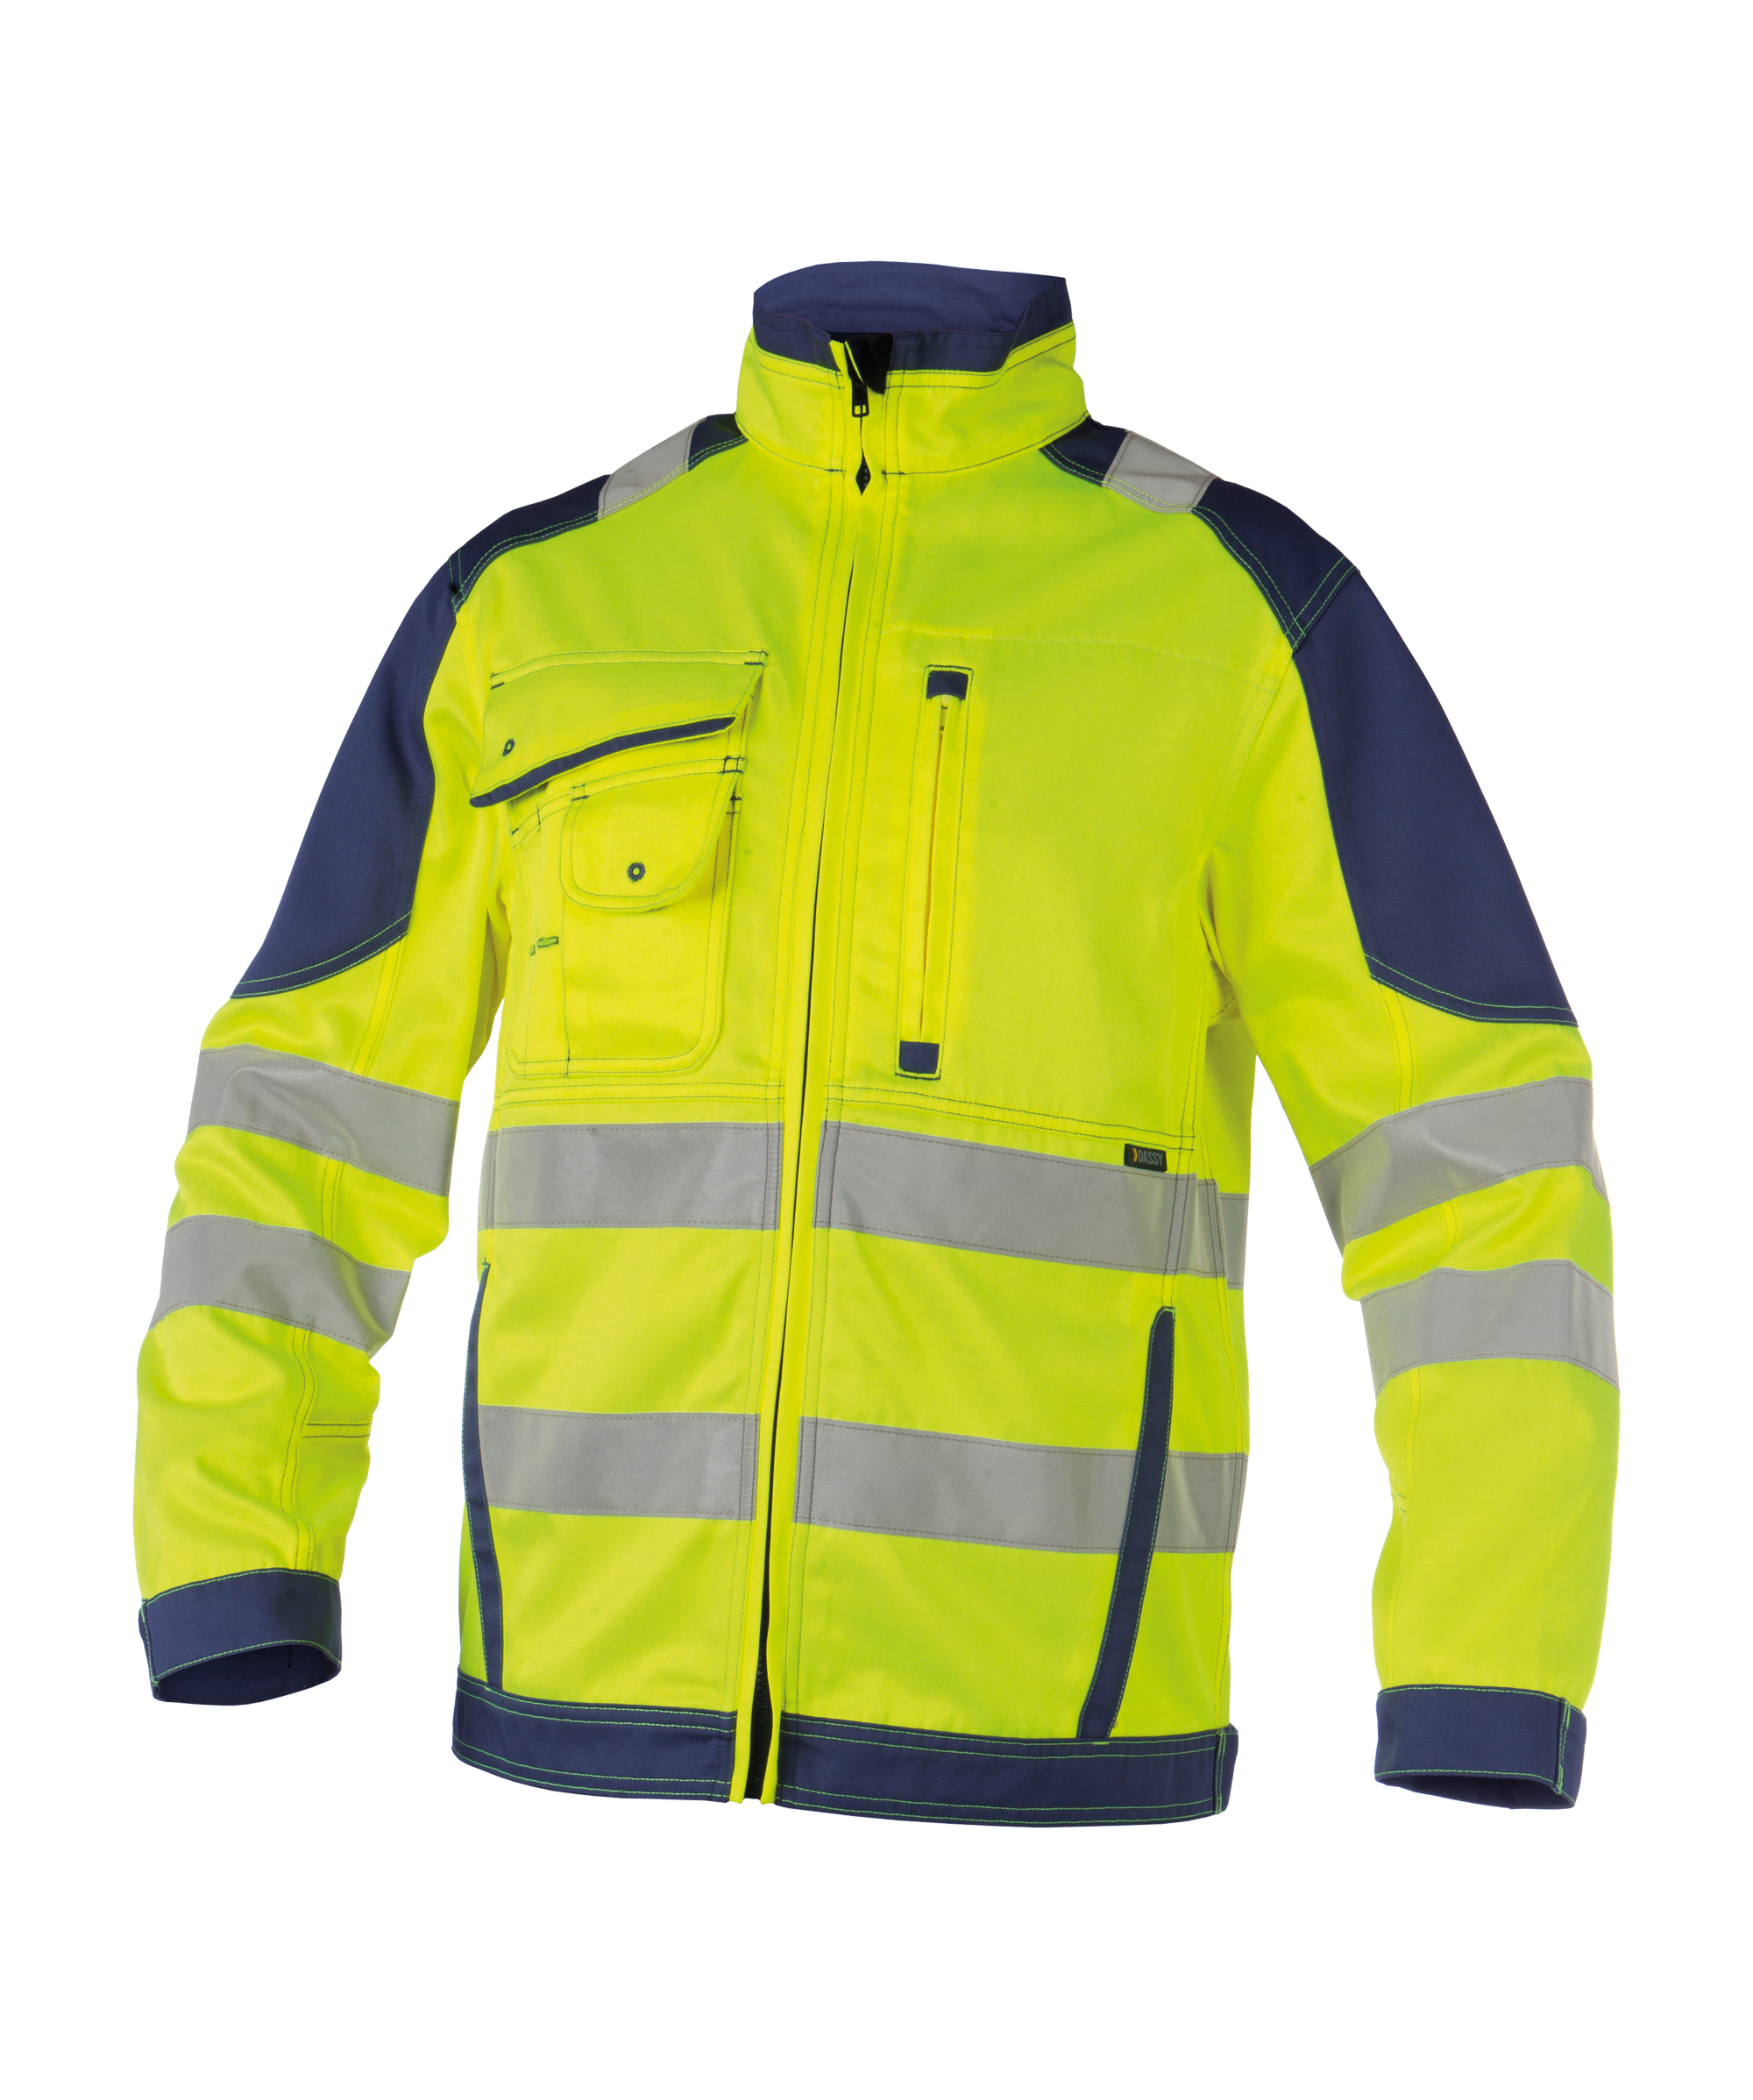 DASSY® Orlando (300367). High visibility work jacket